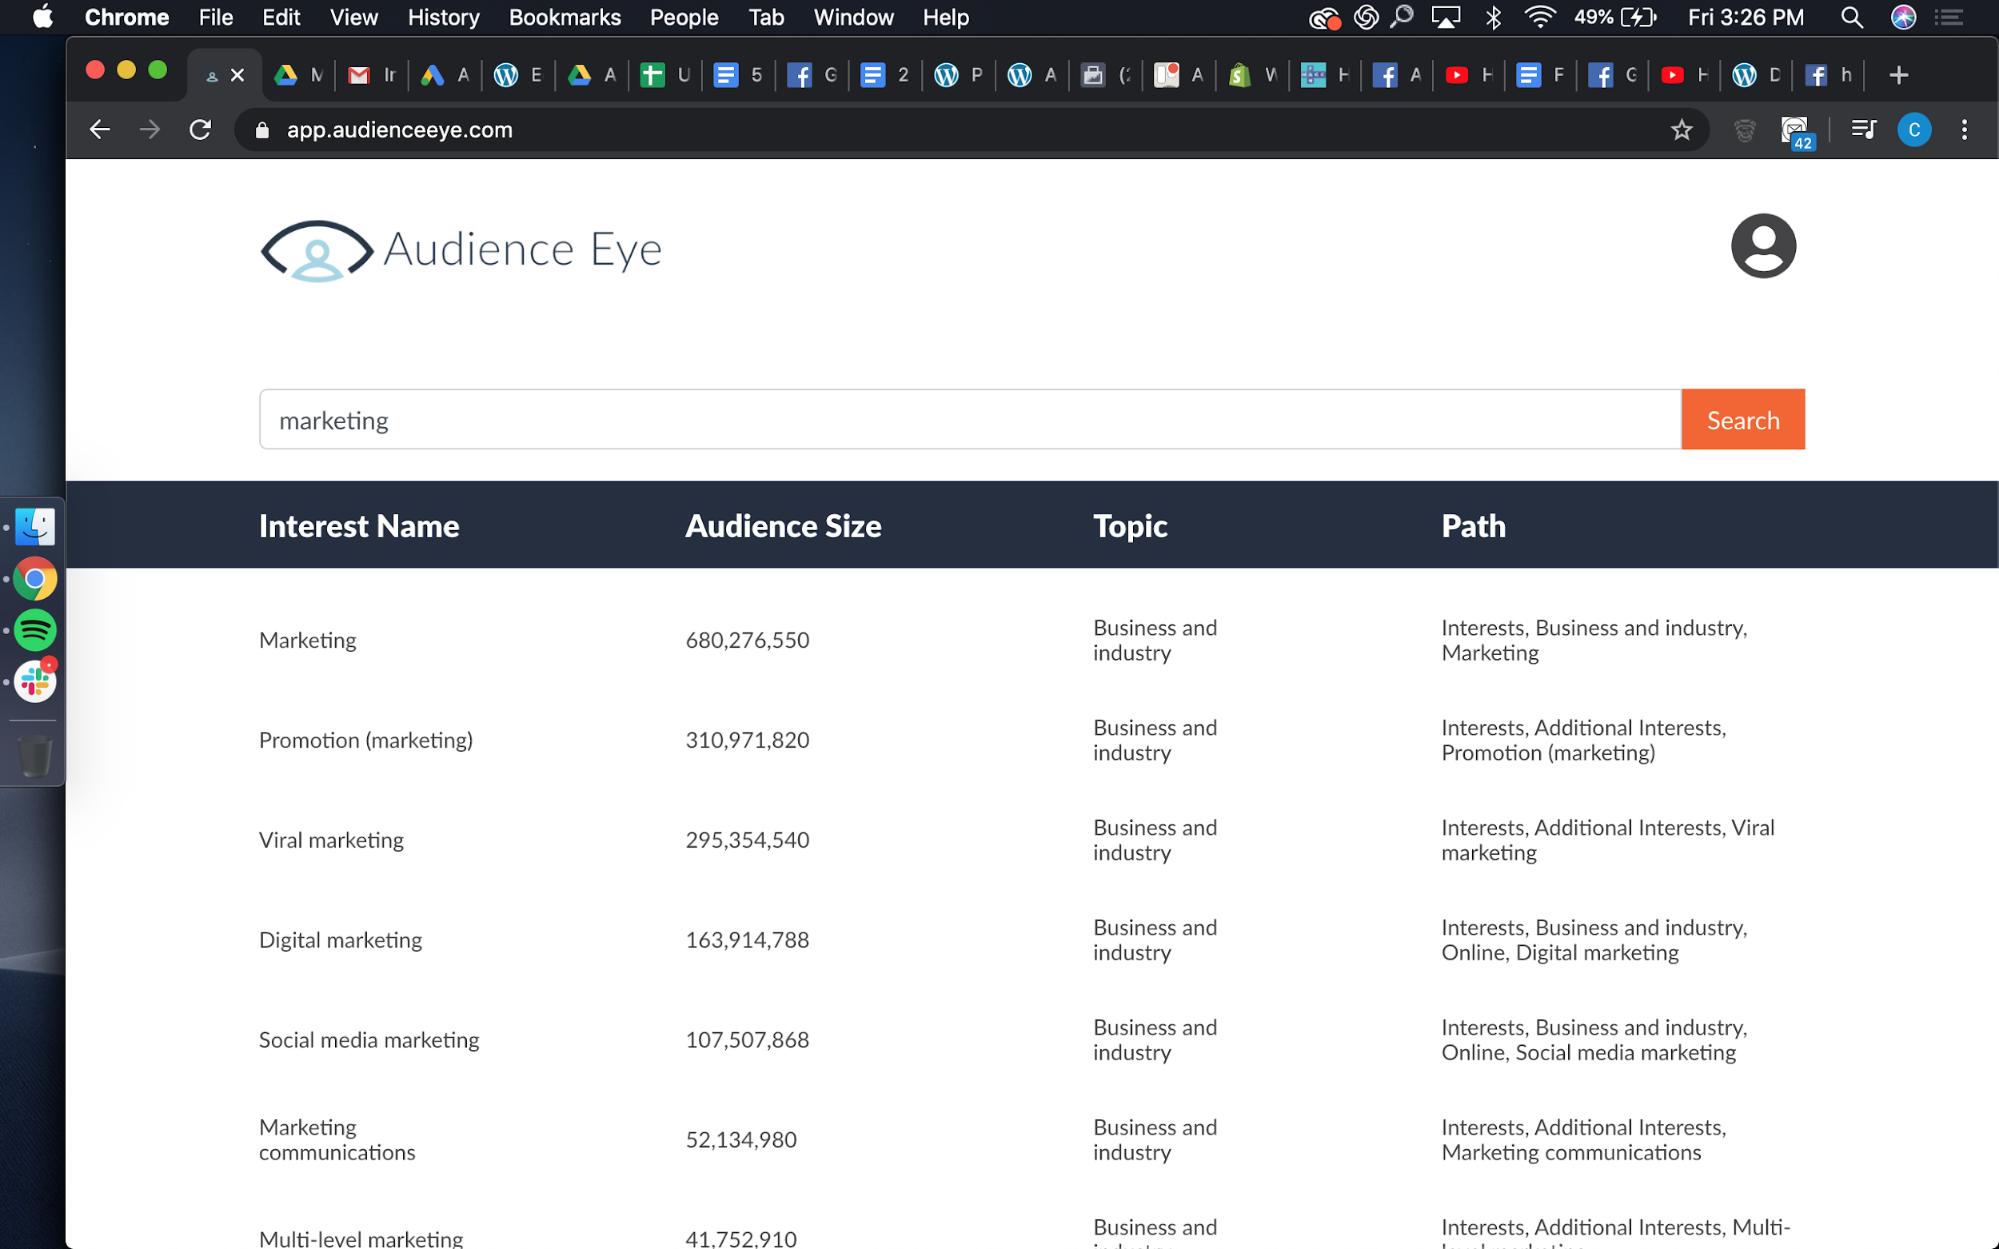 Facebook Hidden Interests audience eye 1